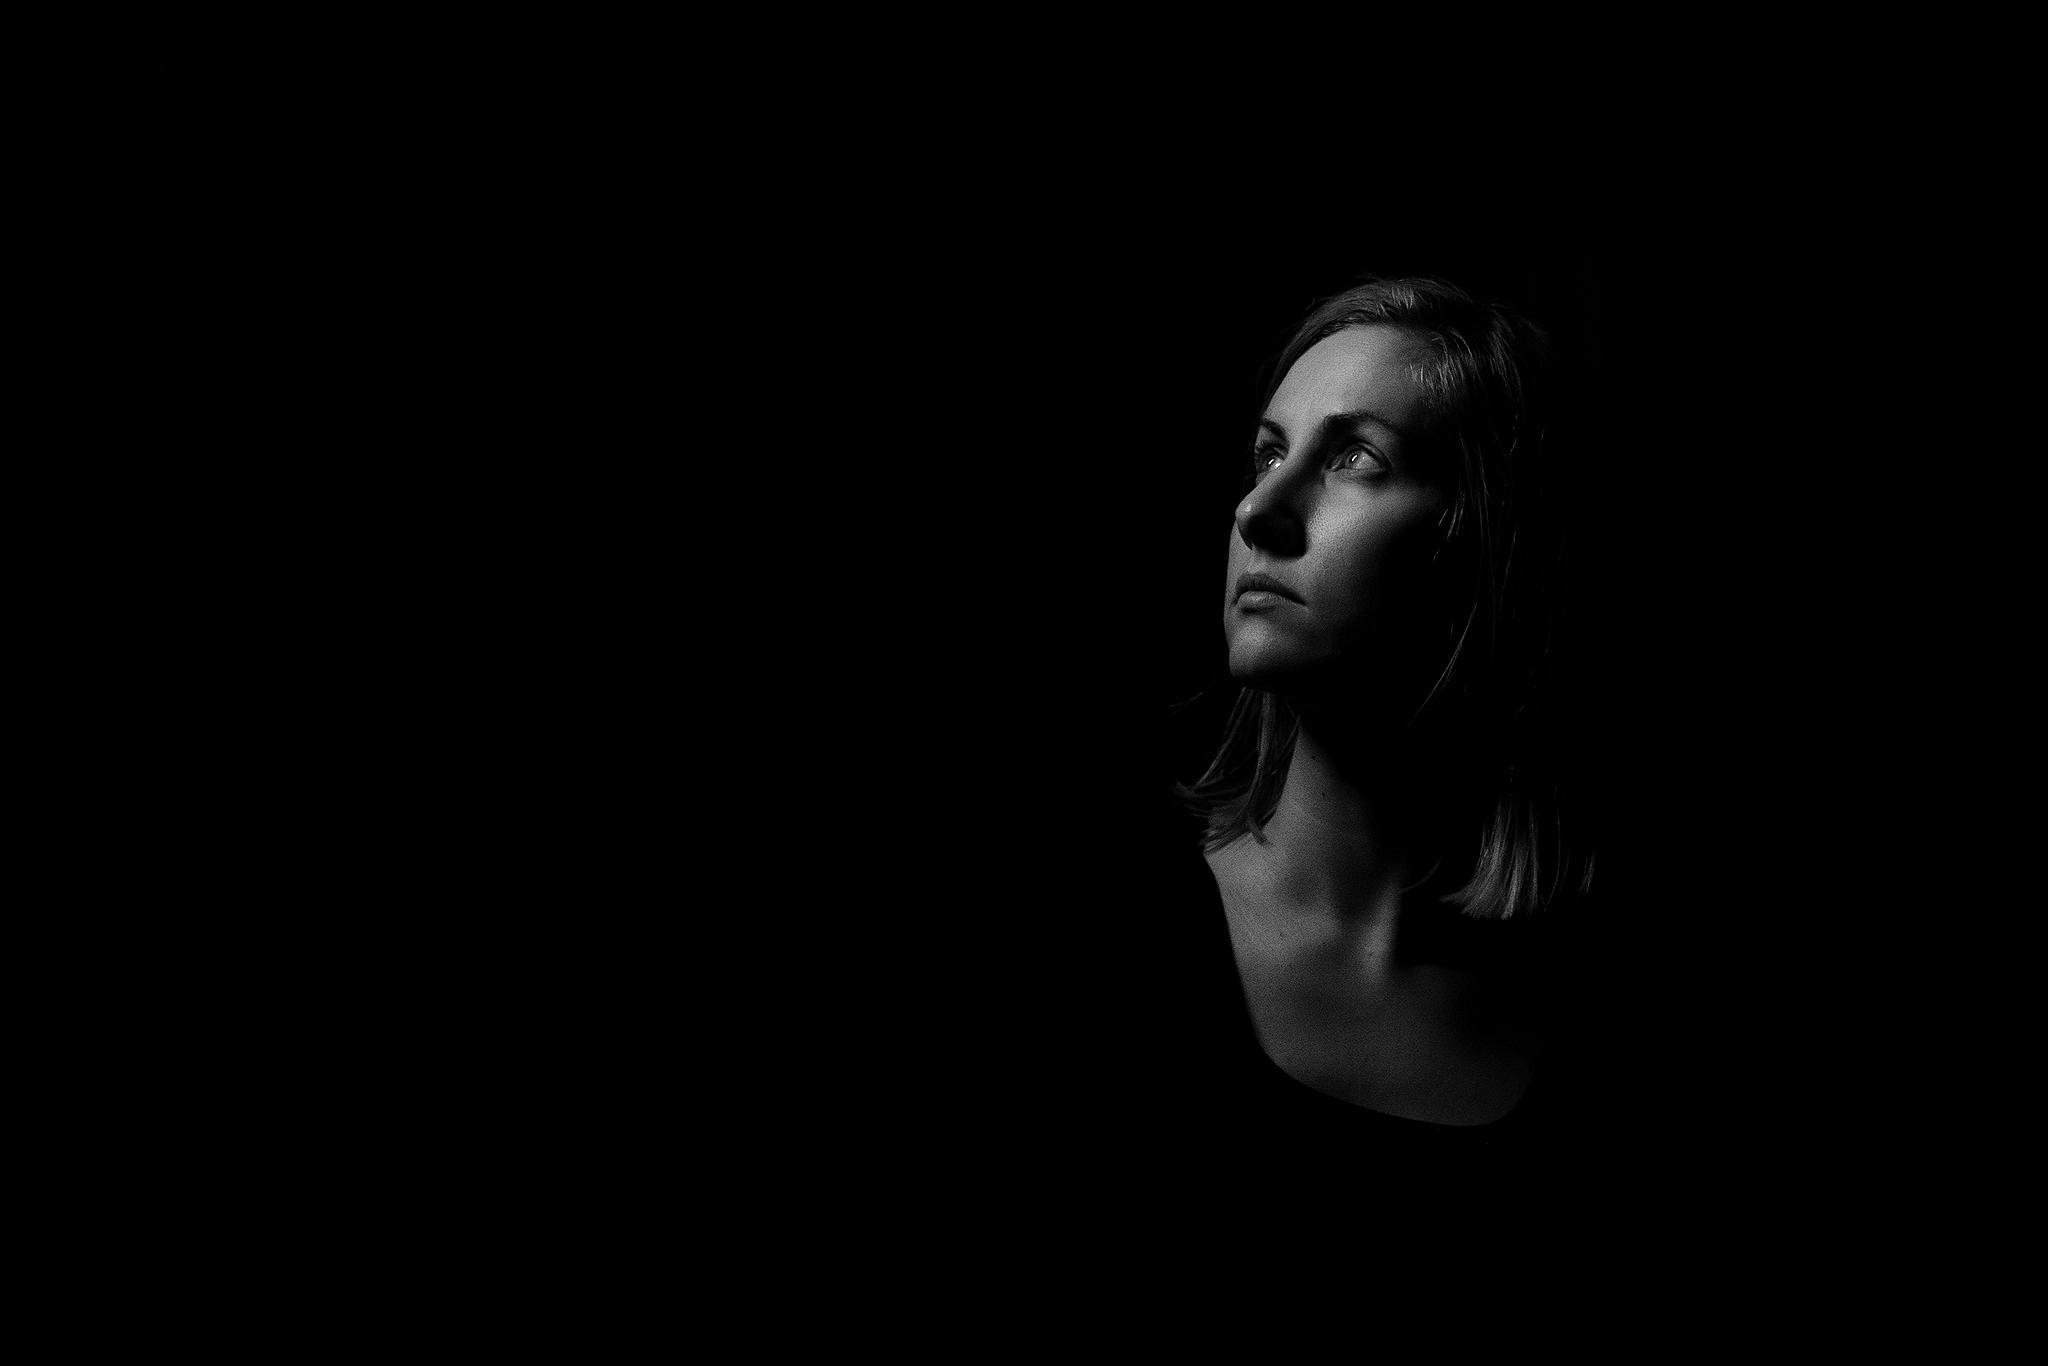 Hello-Olivia-photography-selfie-emotional-me-lice-light